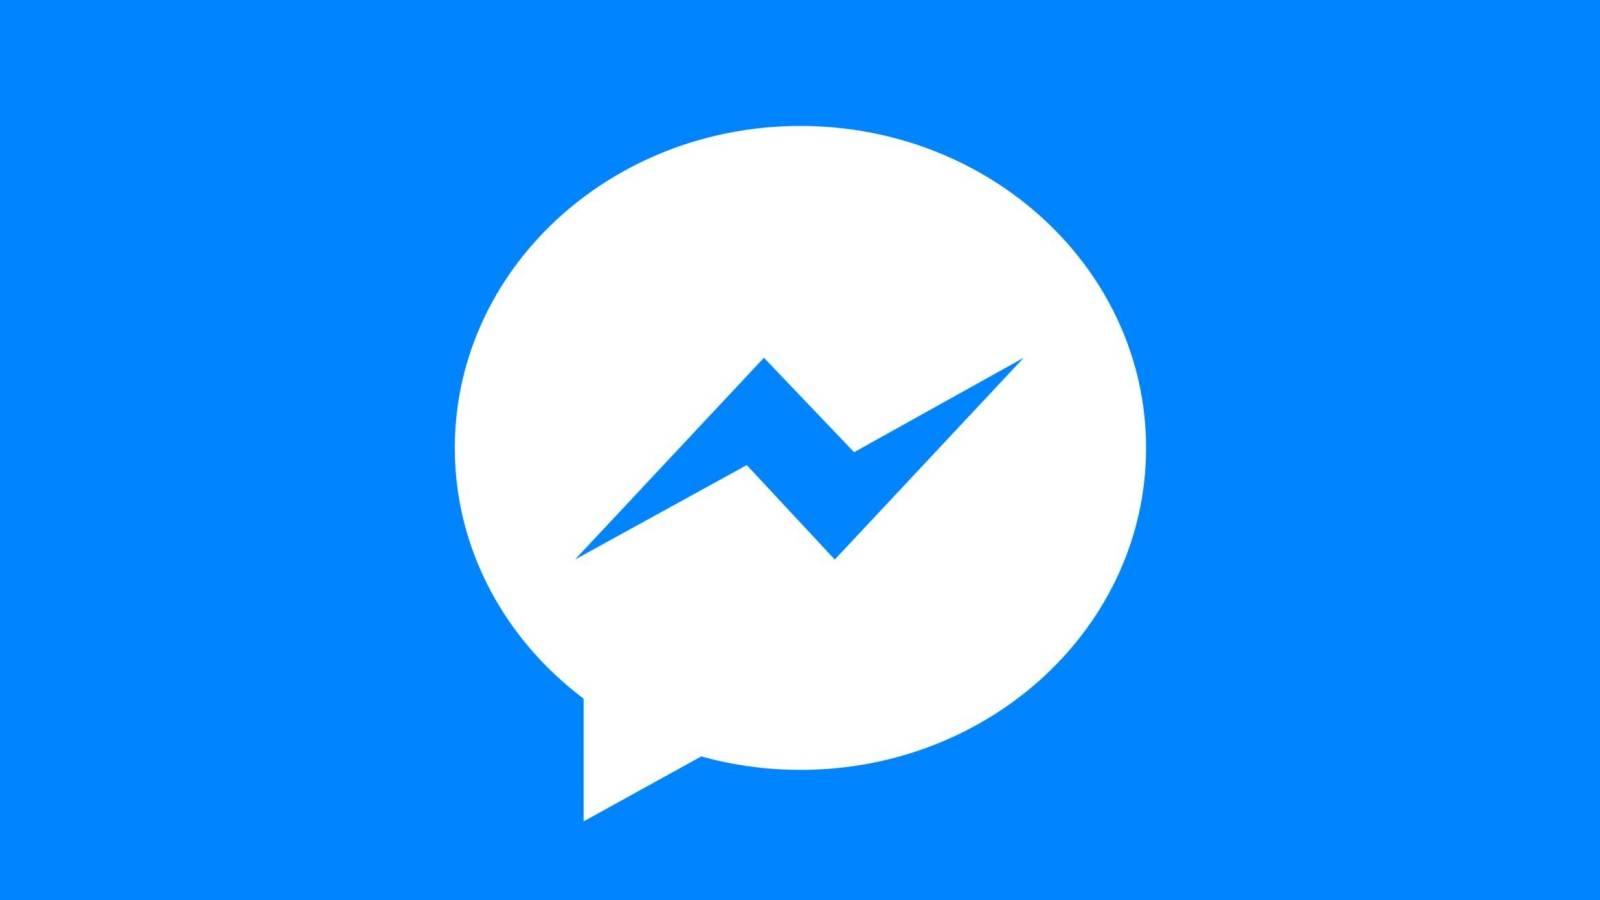 Facebook Messenger Actualizarea Noua Lansata Iata Schimbarile